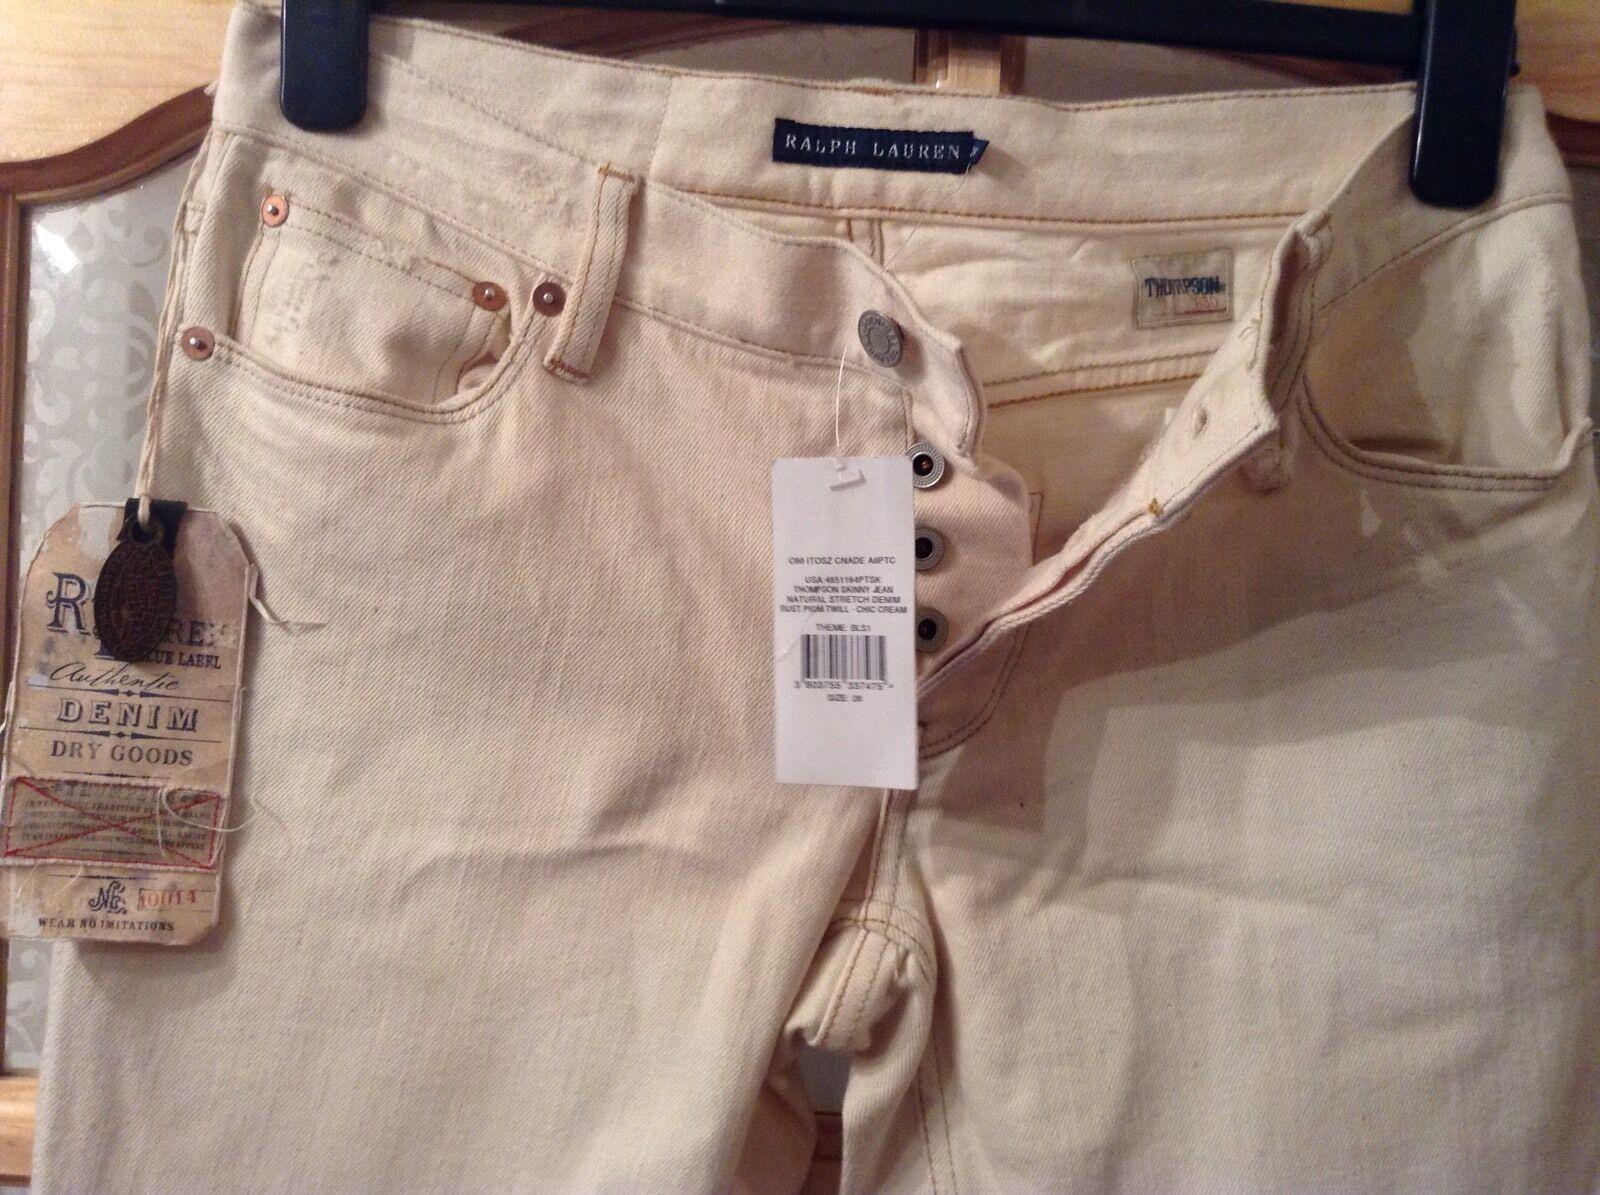 BNWT   Ralph Lauren  W 28  Thompson 650 Skinny Cream Stretch Denim Jeans L35